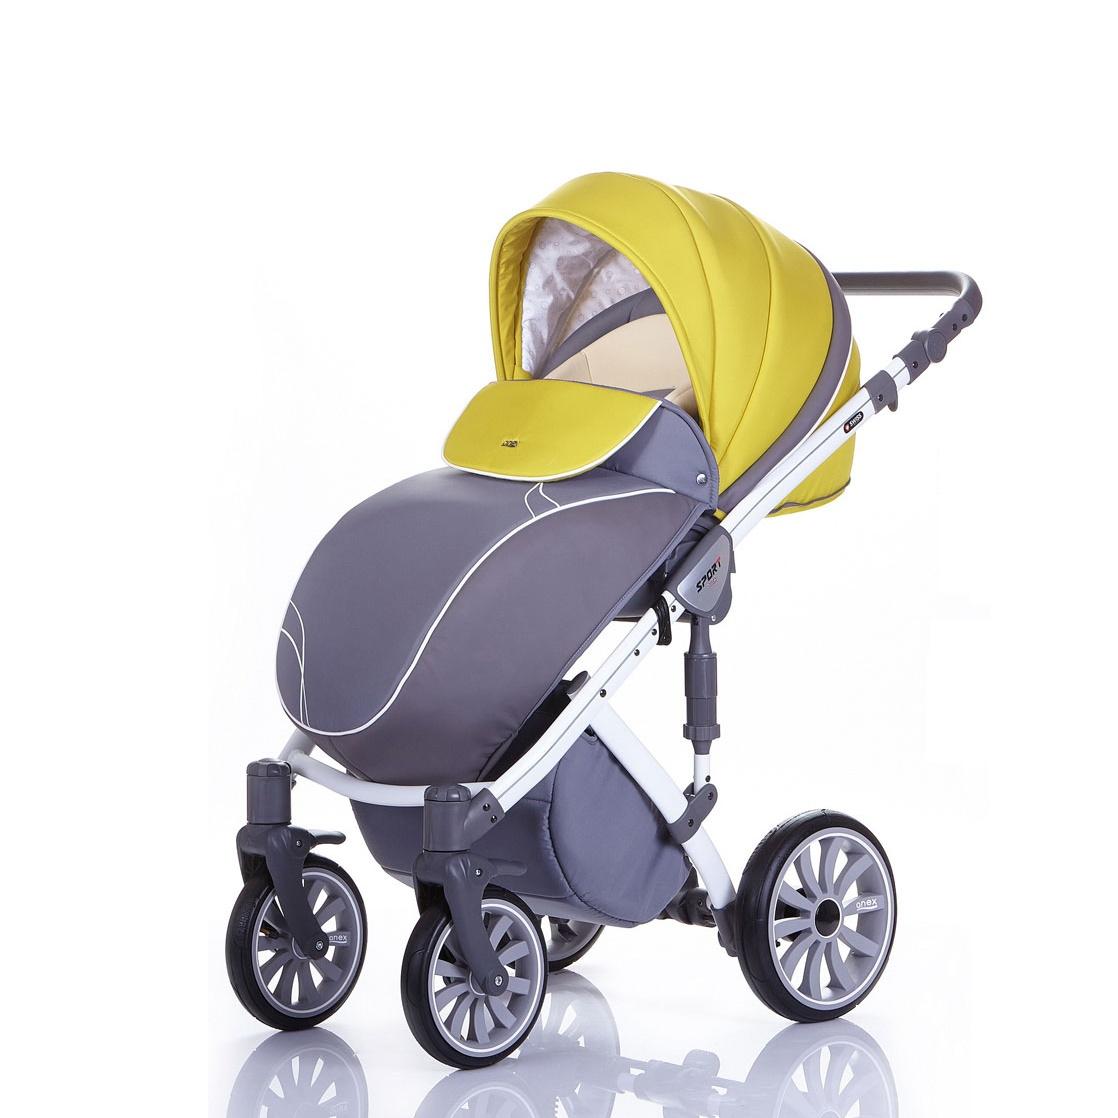 ������� Anex Sport 2 � 1 Q1 PA01 gray+mustard